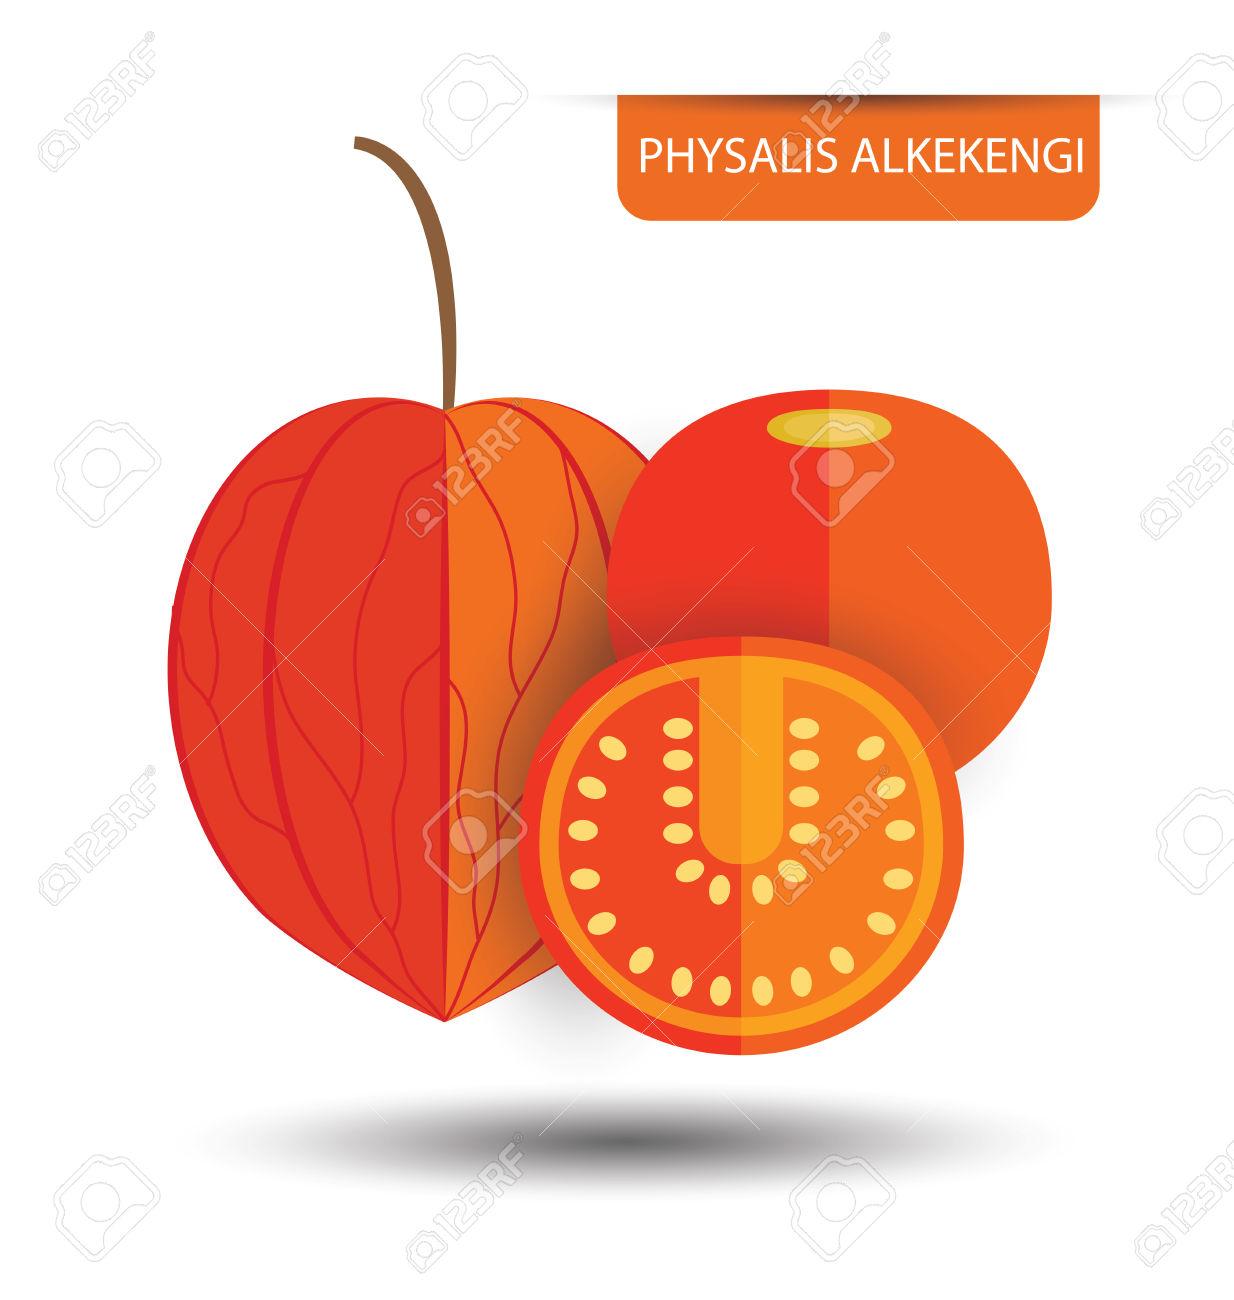 Physalis Alkekengi, Physalis Fruit Vector Illustration Royalty.